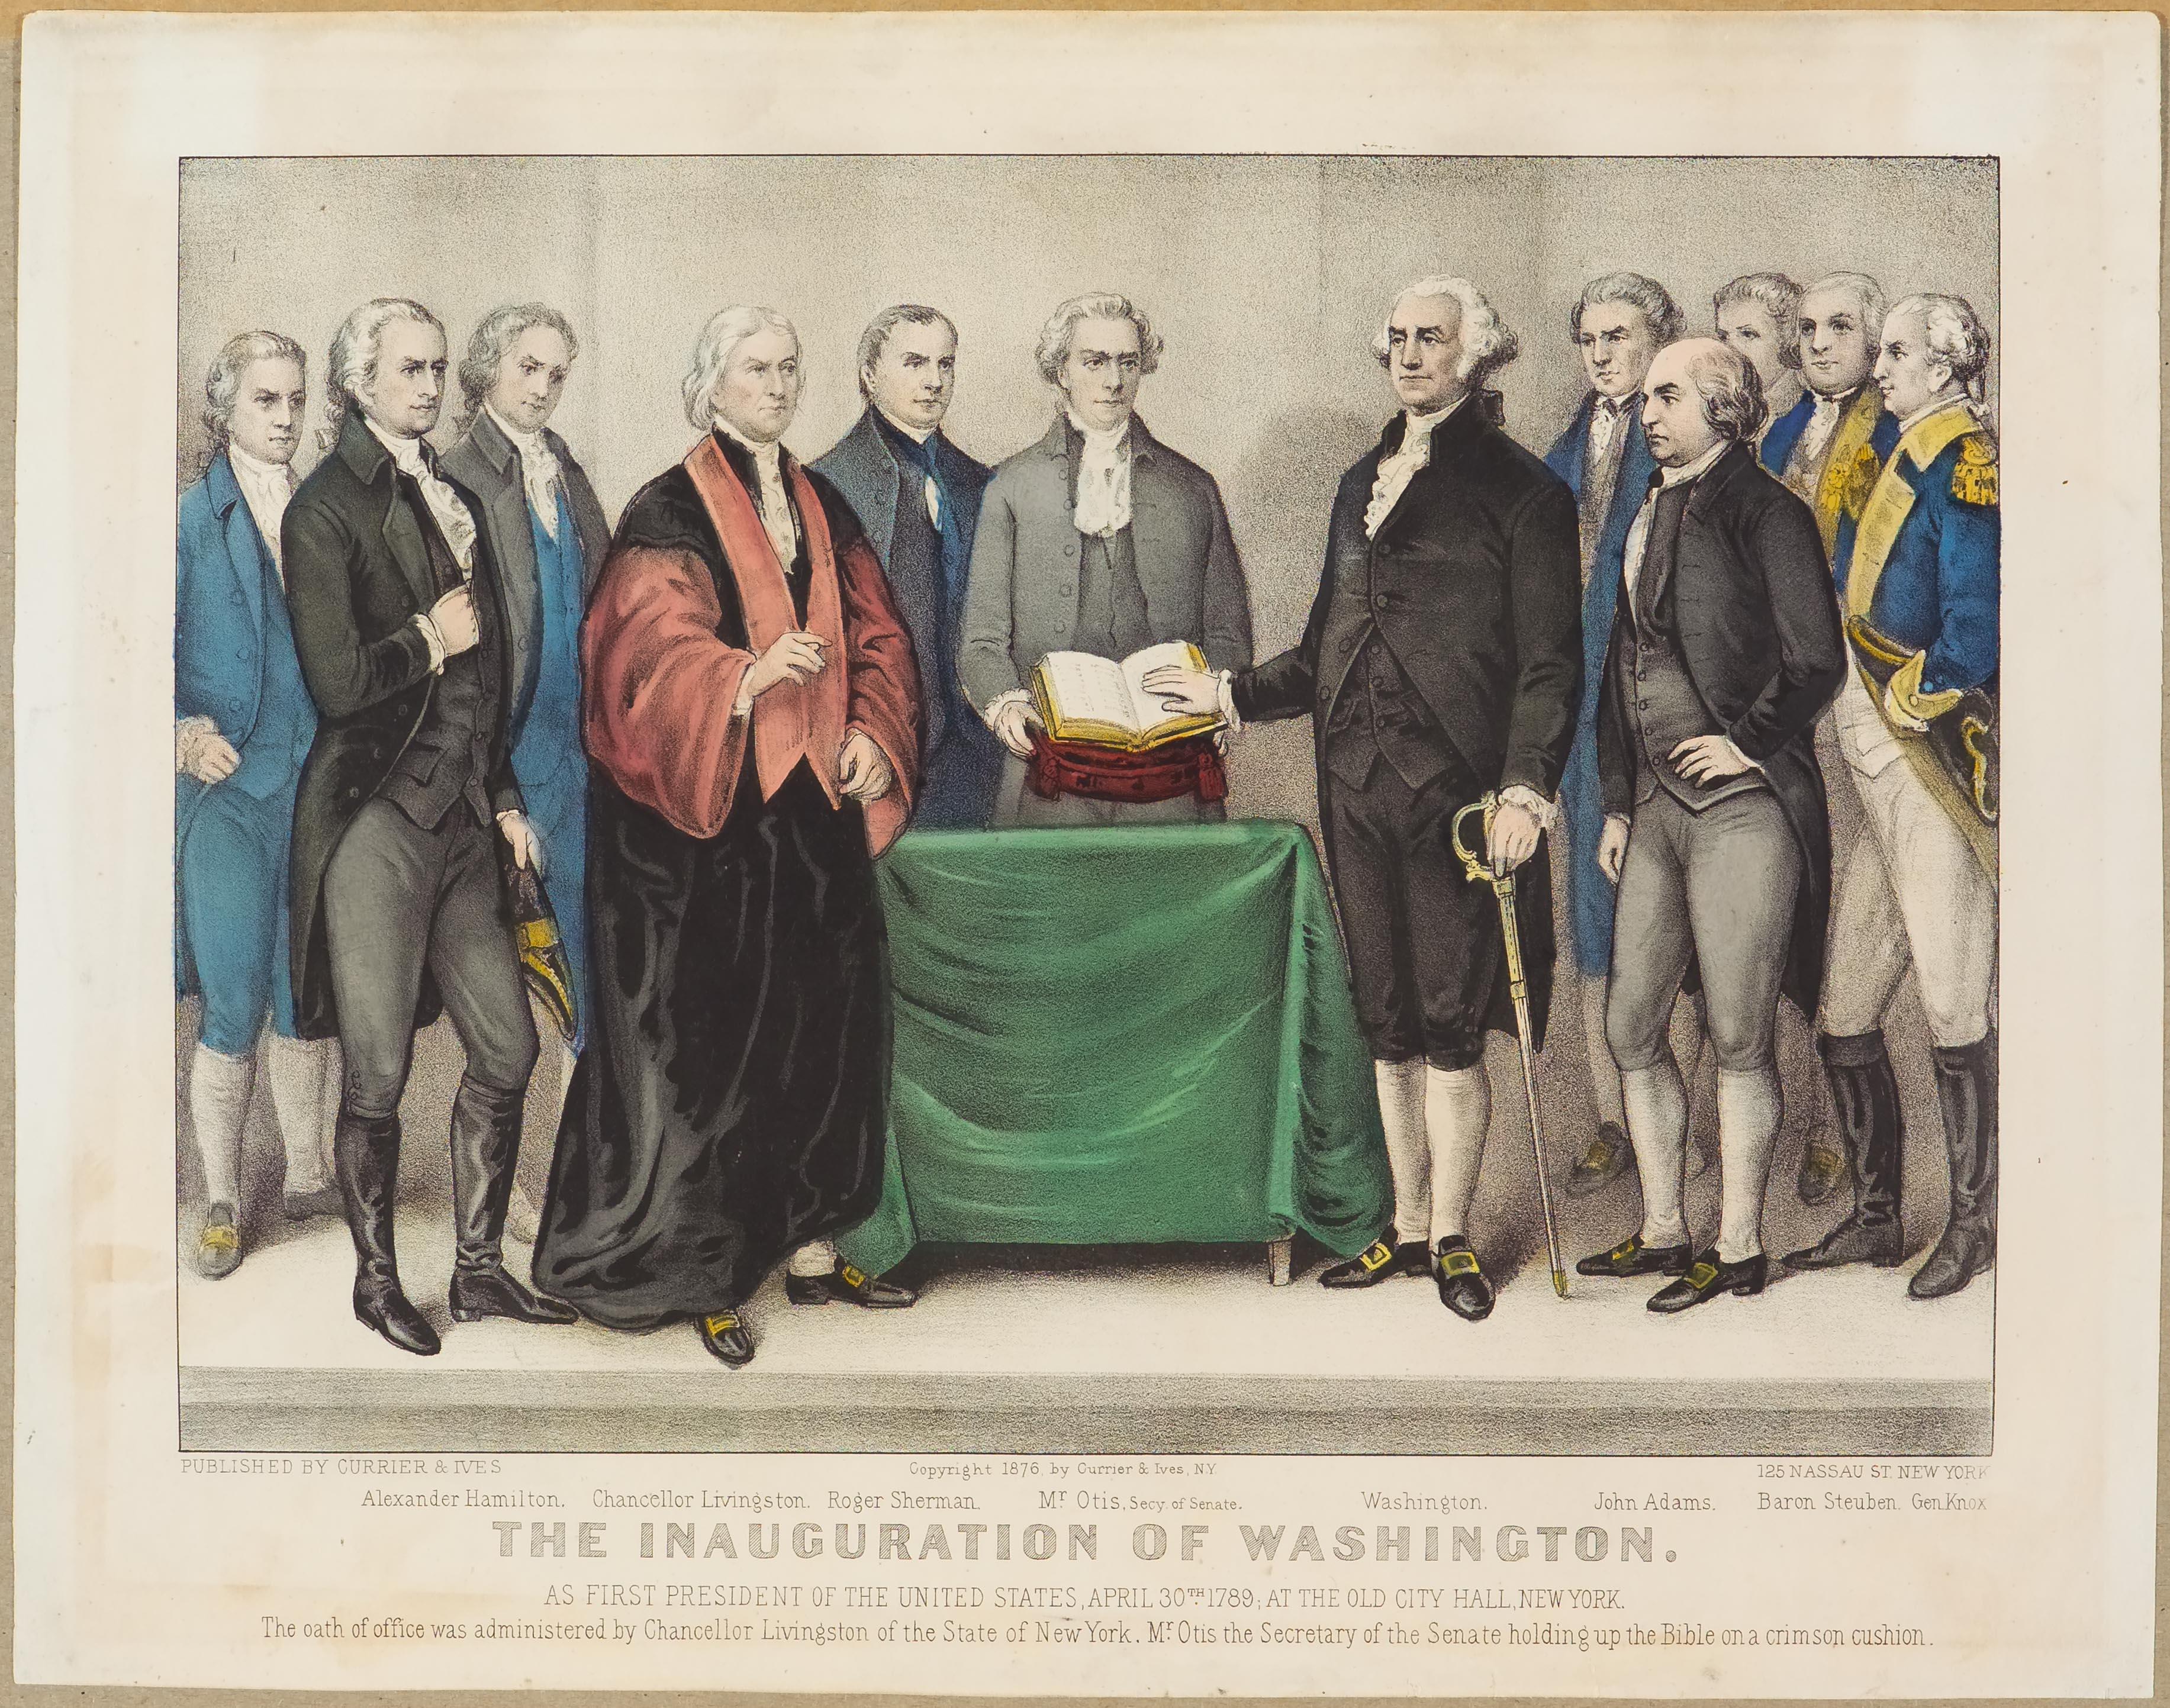 1789 George Washington The Inauguration Of Washington As First President Of